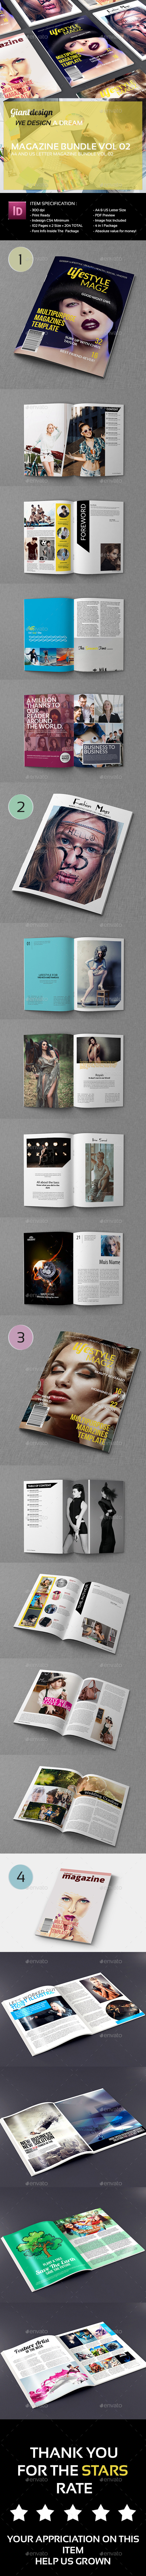 Magazine Bundle Vol 02 - Magazines Print Templates